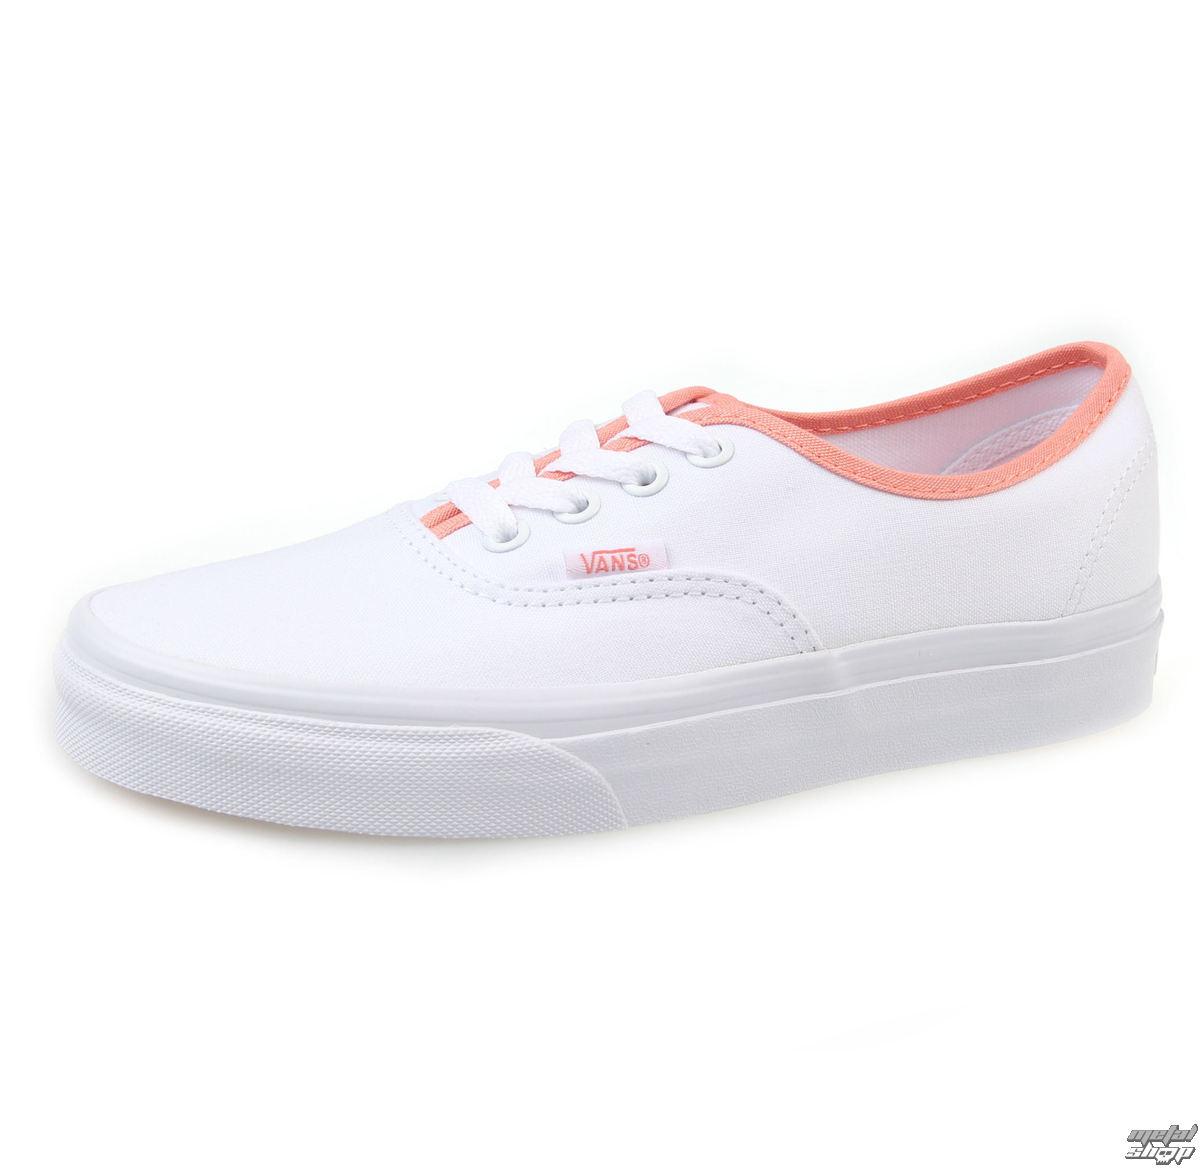 topánky dámske VANS - Authentic - Pop binding - V3B9IHS